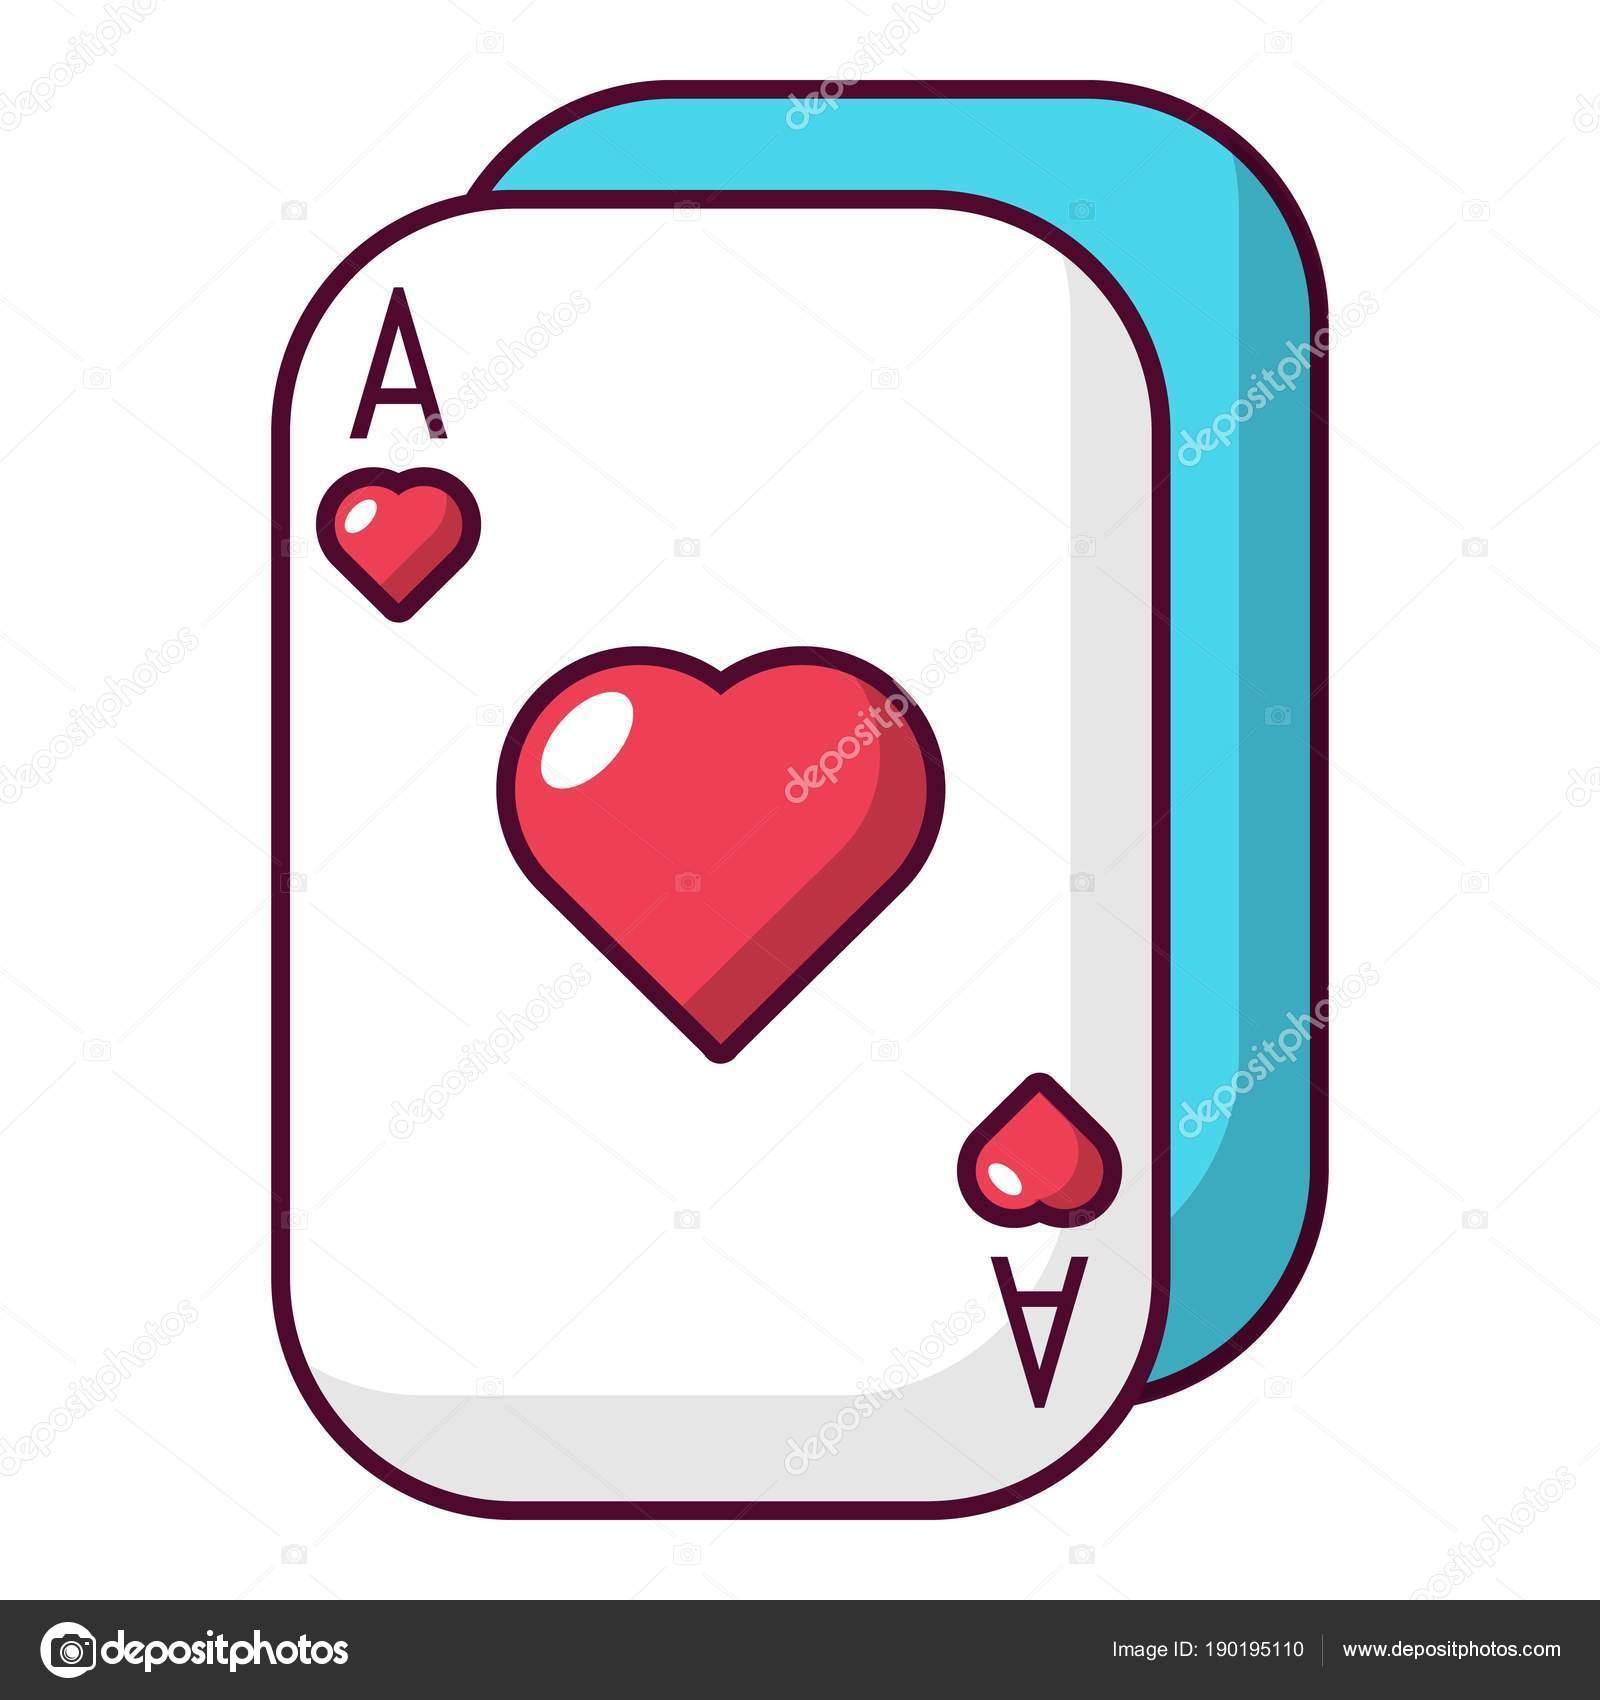 Dibujos: cartas de poker | Icono de cartas de Poker